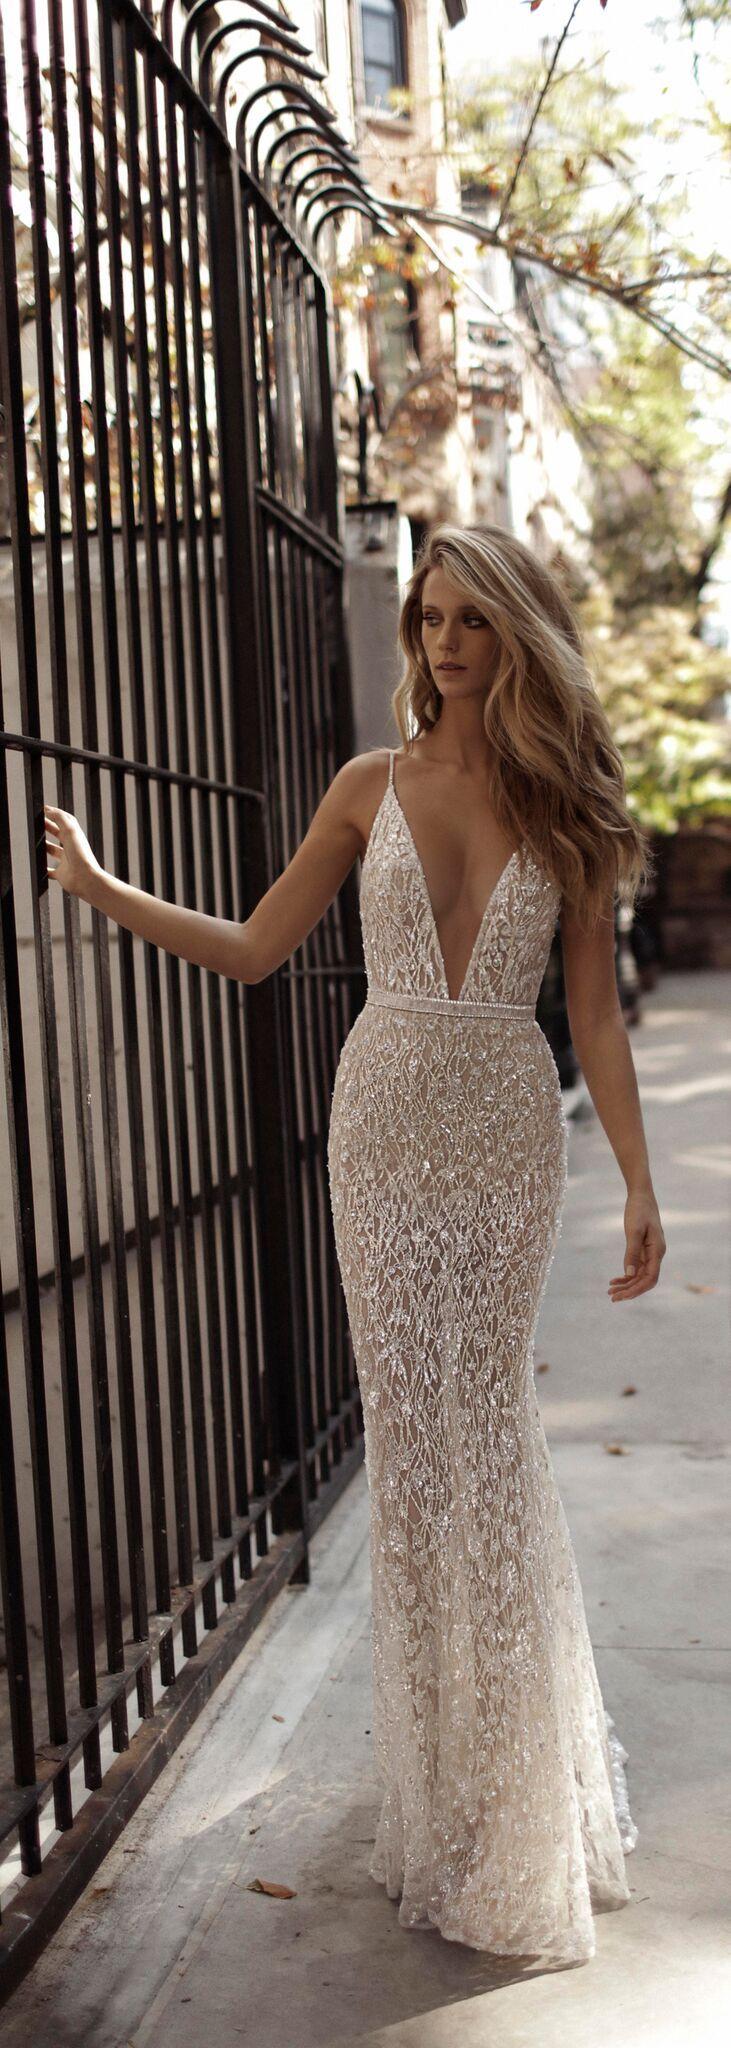 6ce0f8dc5065f Pin by Tori Lioi on dresses | Sexy wedding dresses, Dresses, Wedding ...